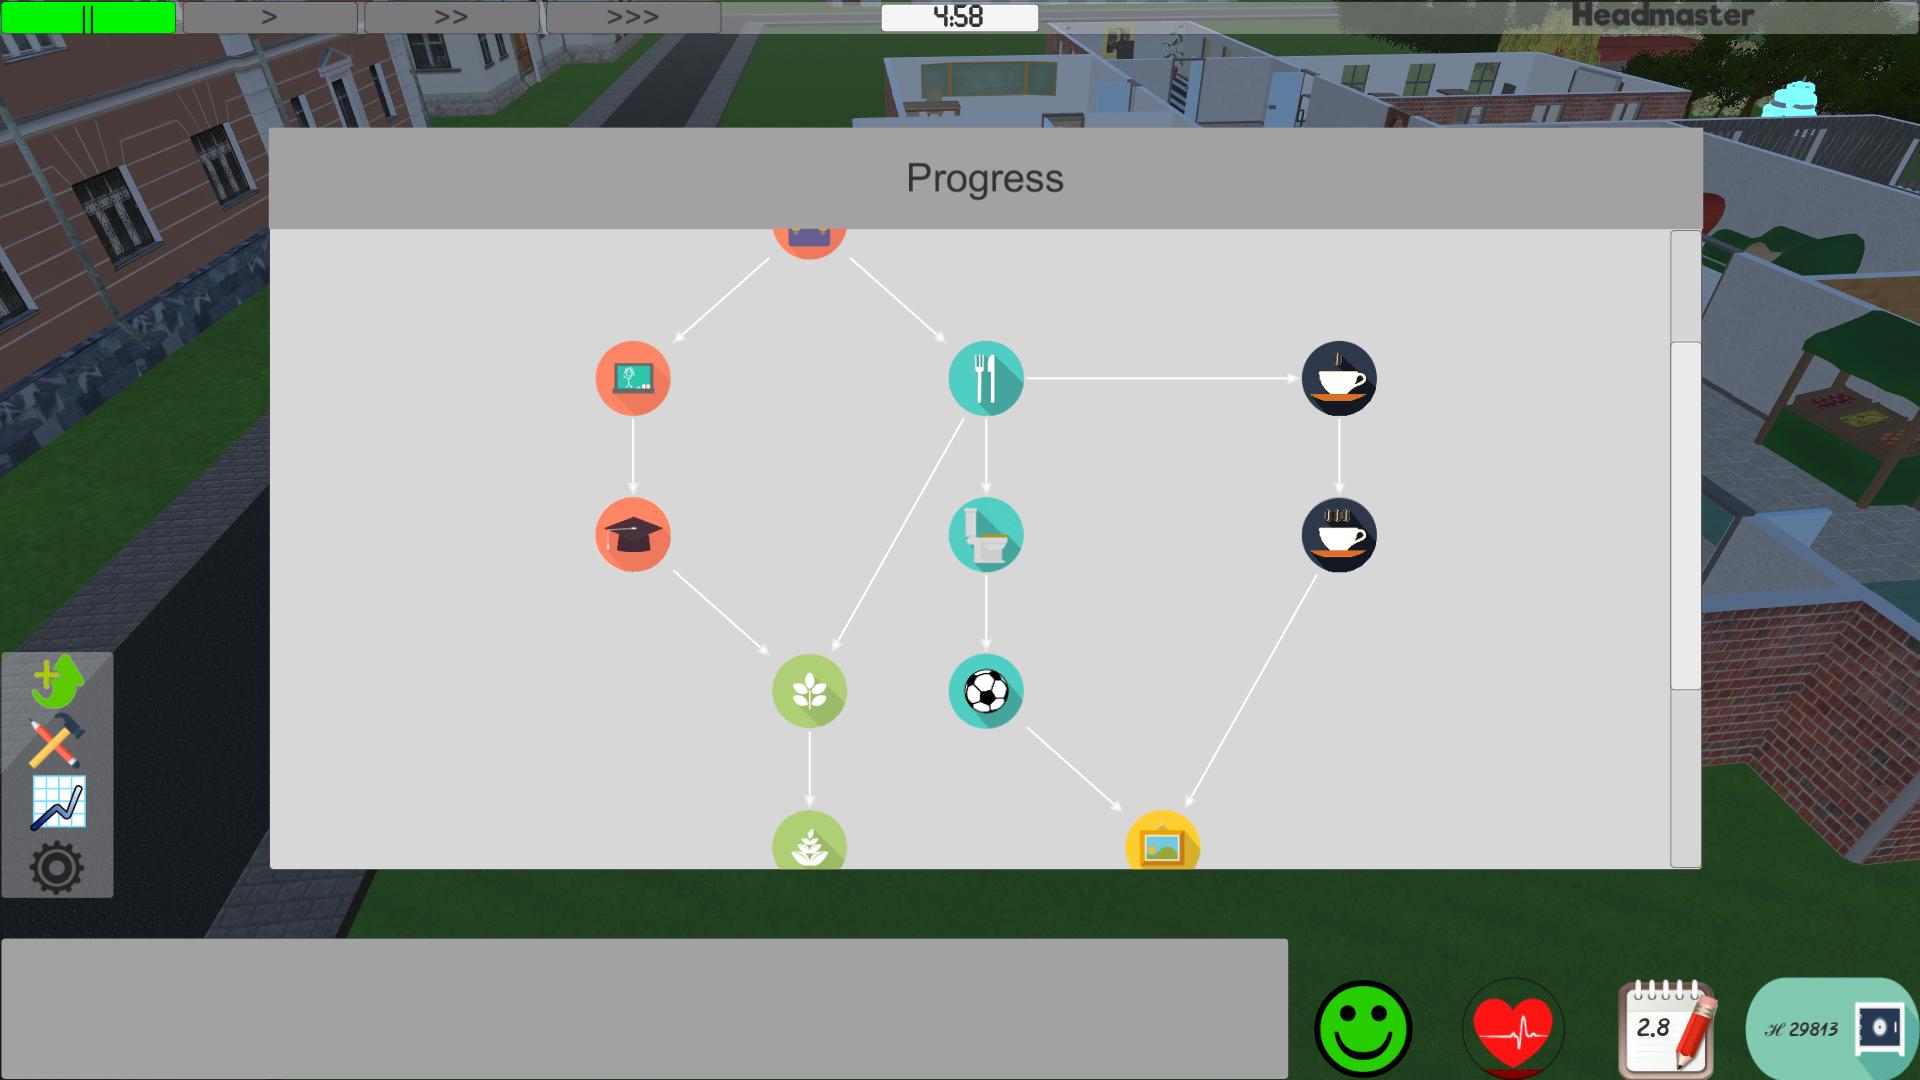 The upgrade menu.